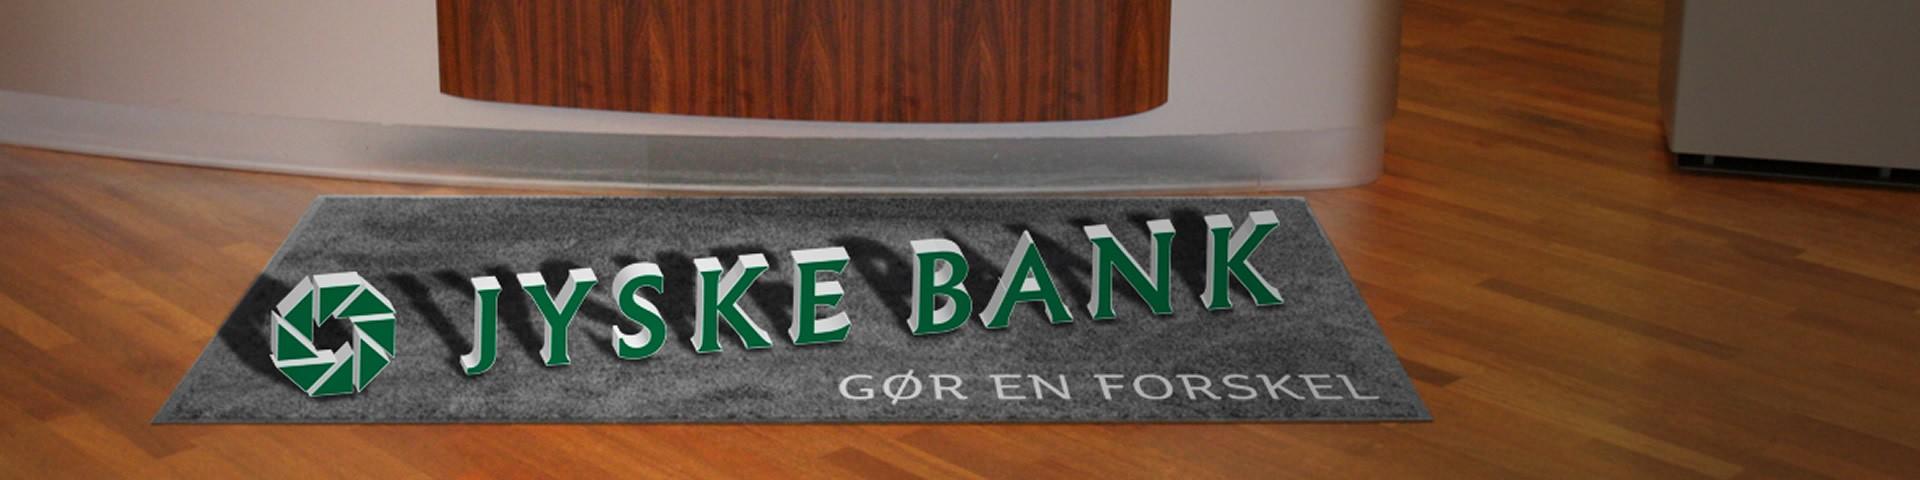 slide_jyske_bank